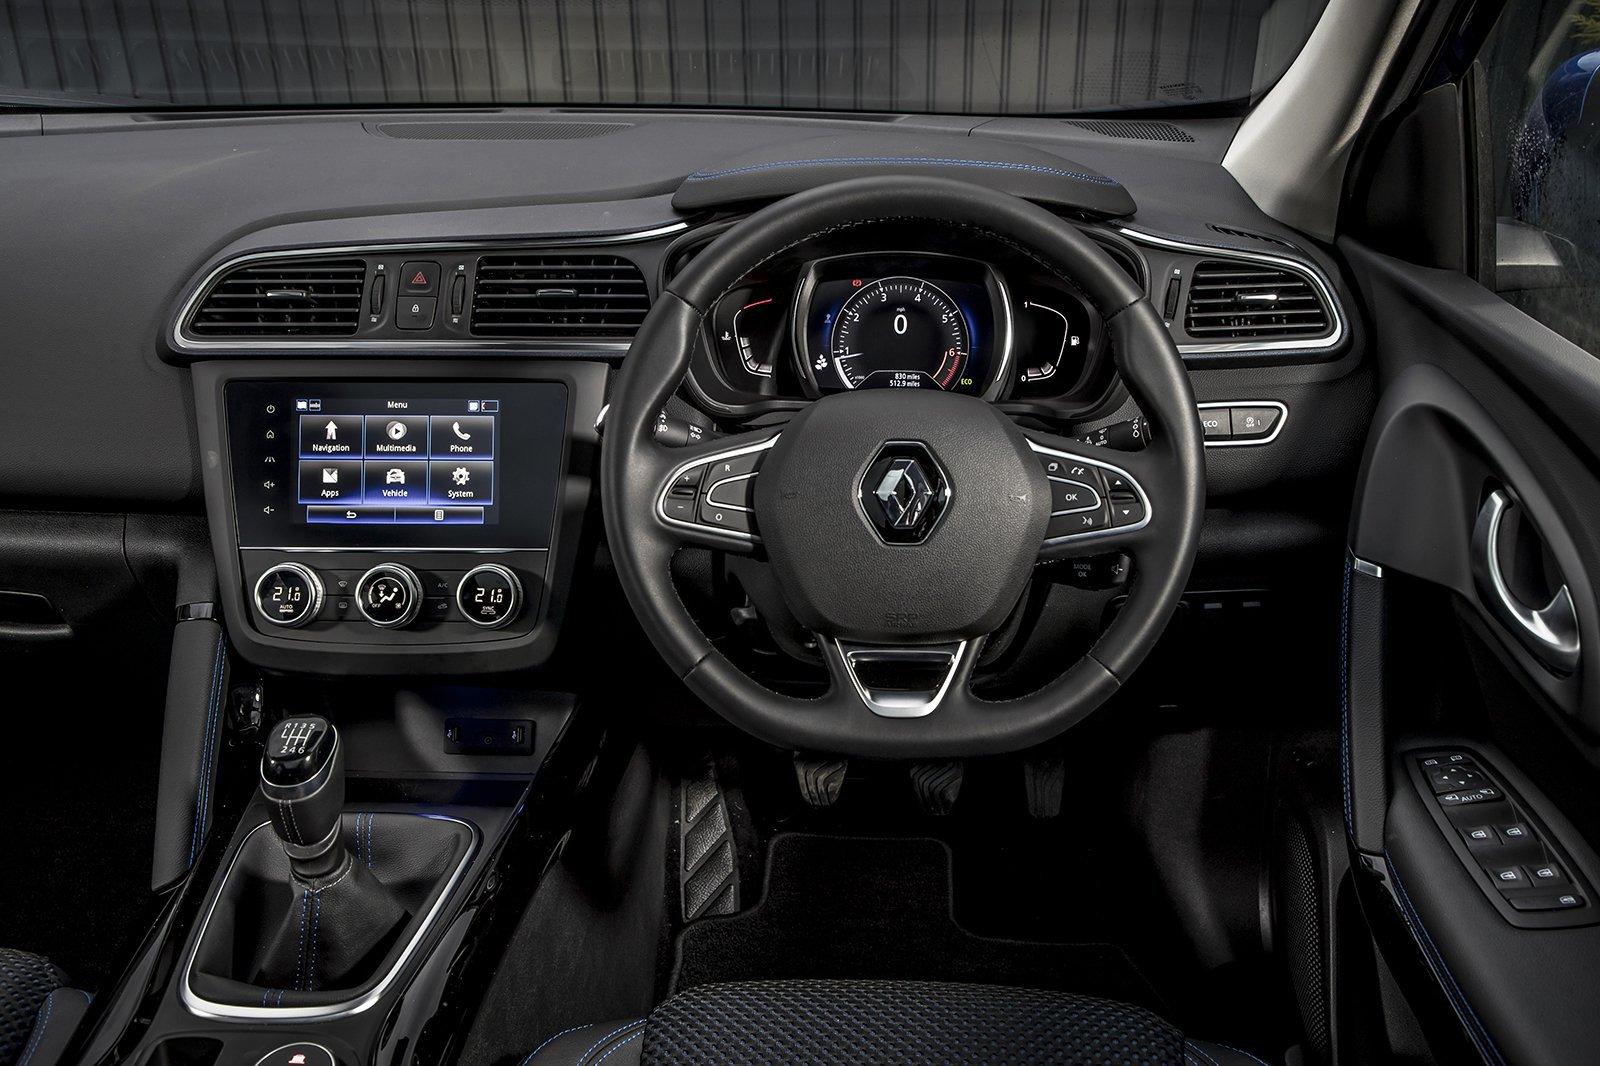 3: Renault Kadjar 1.5 dCi 110 - interior